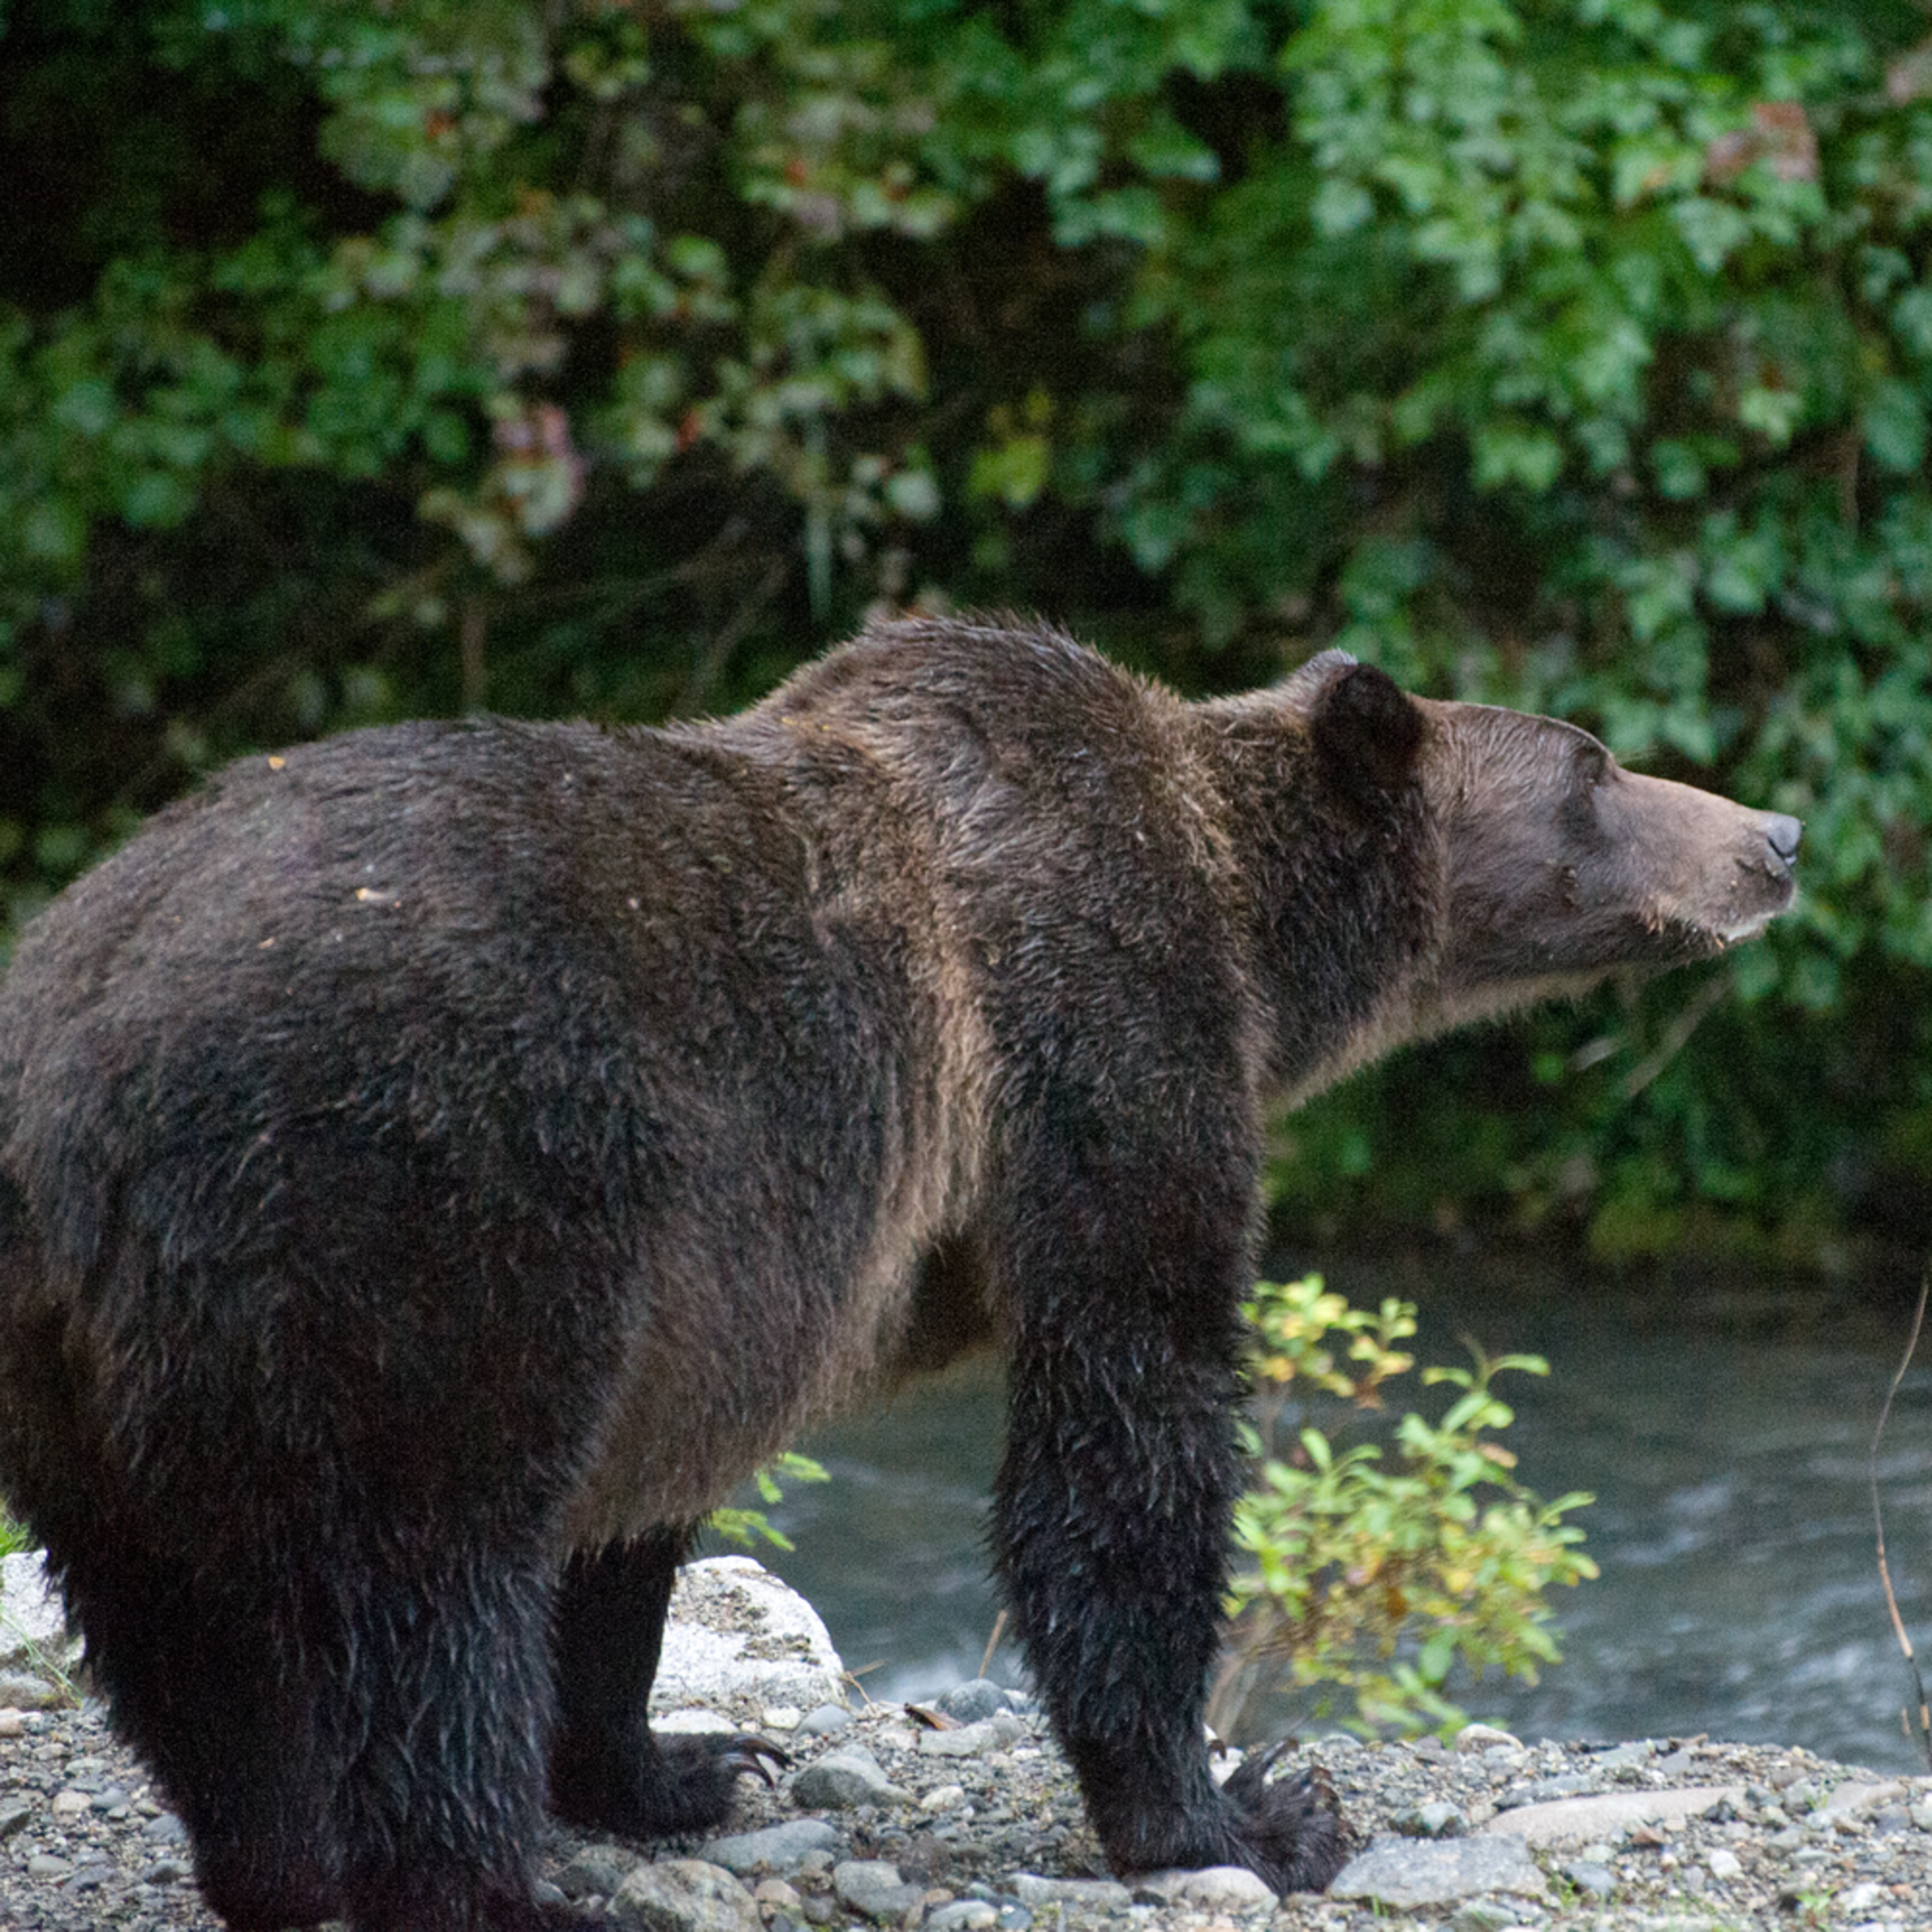 Dsc 5077 grizzly bear hunting  hr0cyc